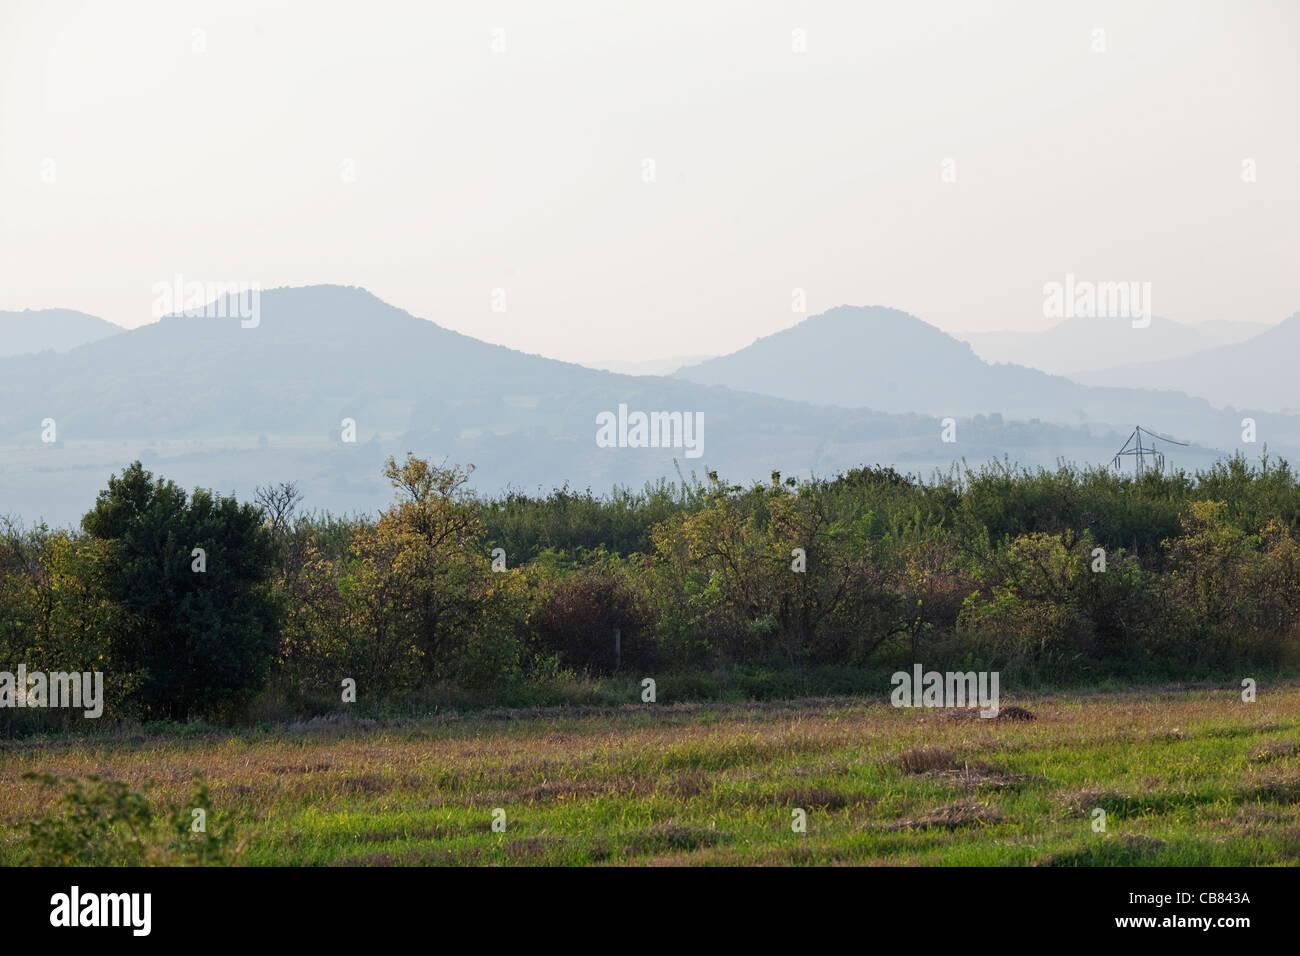 Landscape of Bohemian Central Mountains, Ceske Stredohori, near Litomerice in northern Bohemia, Czech Republic. - Stock Image